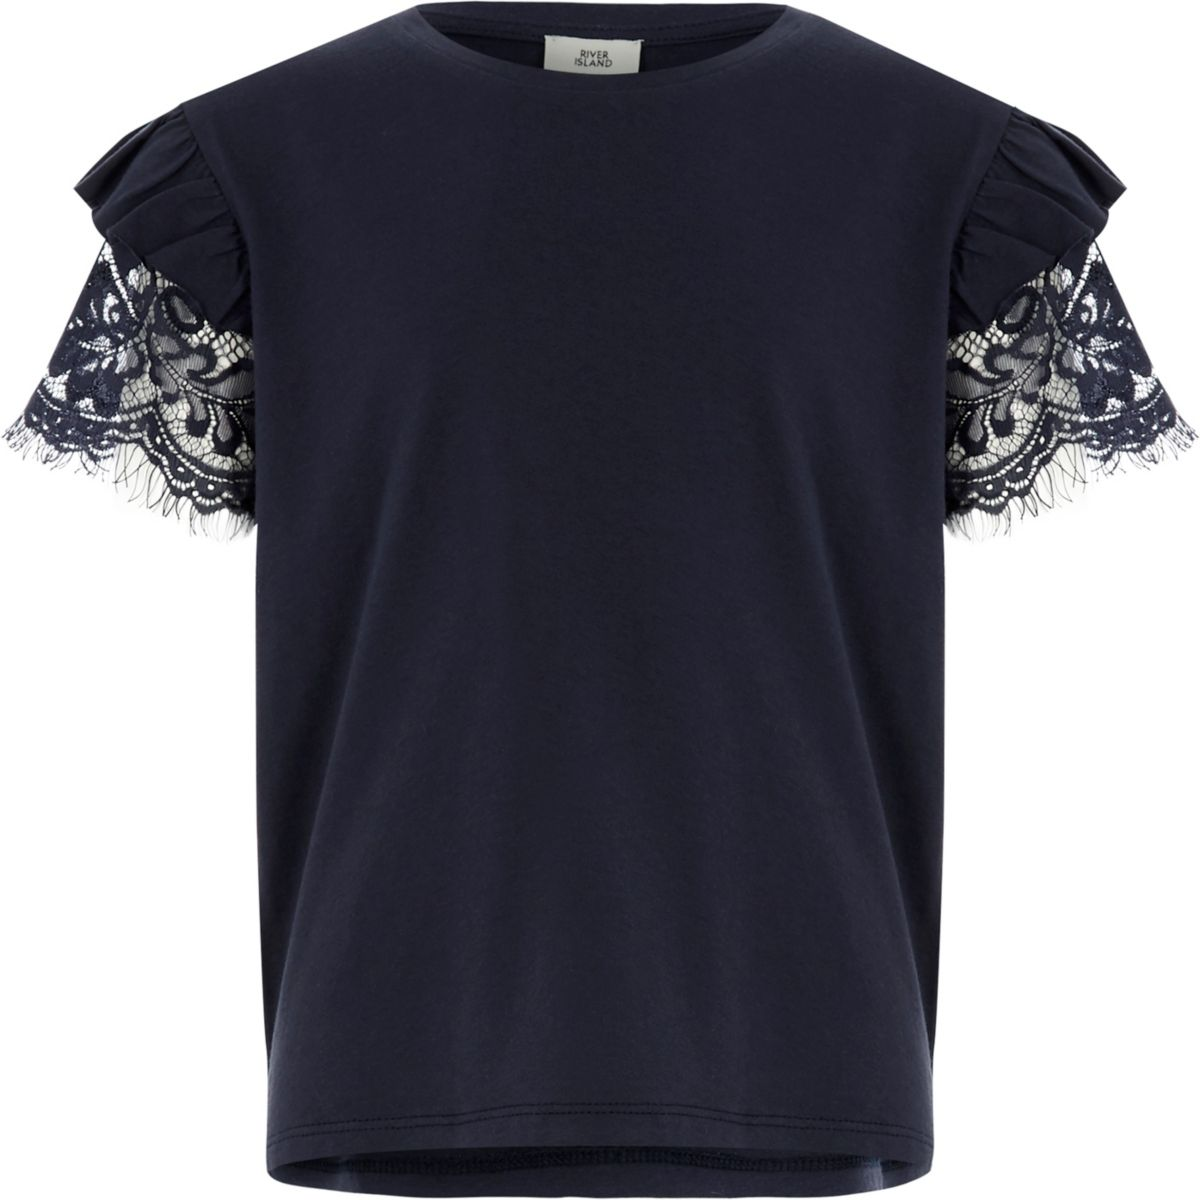 Girls navy frill lace short sleeve T-shirt